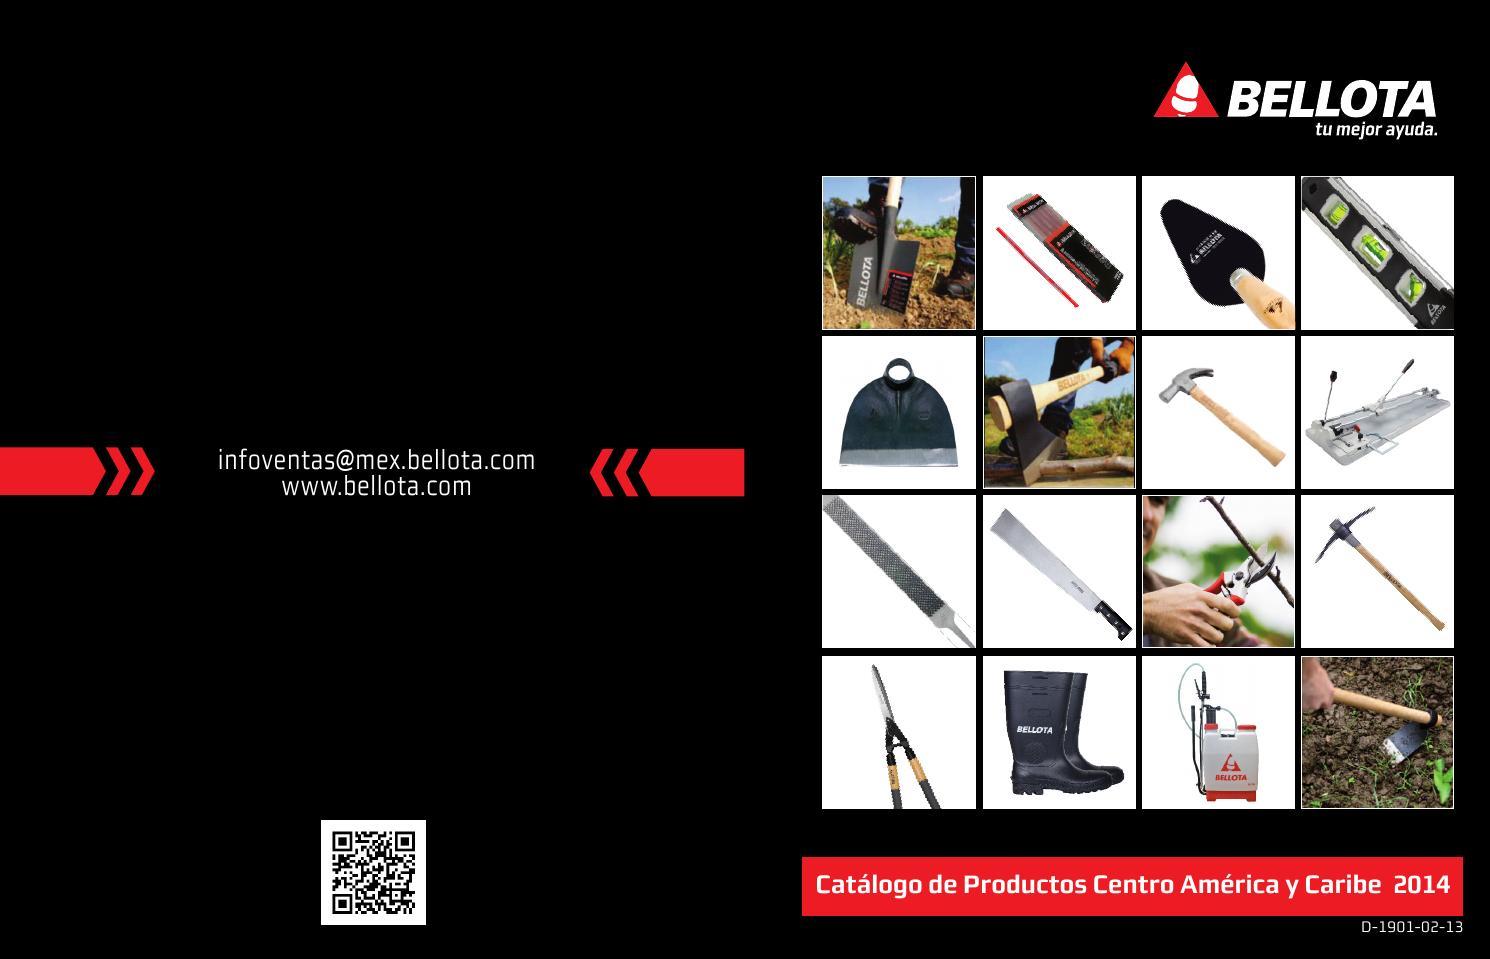 Talla 40 Bellota 72243-40 Bota Negra PVC S5